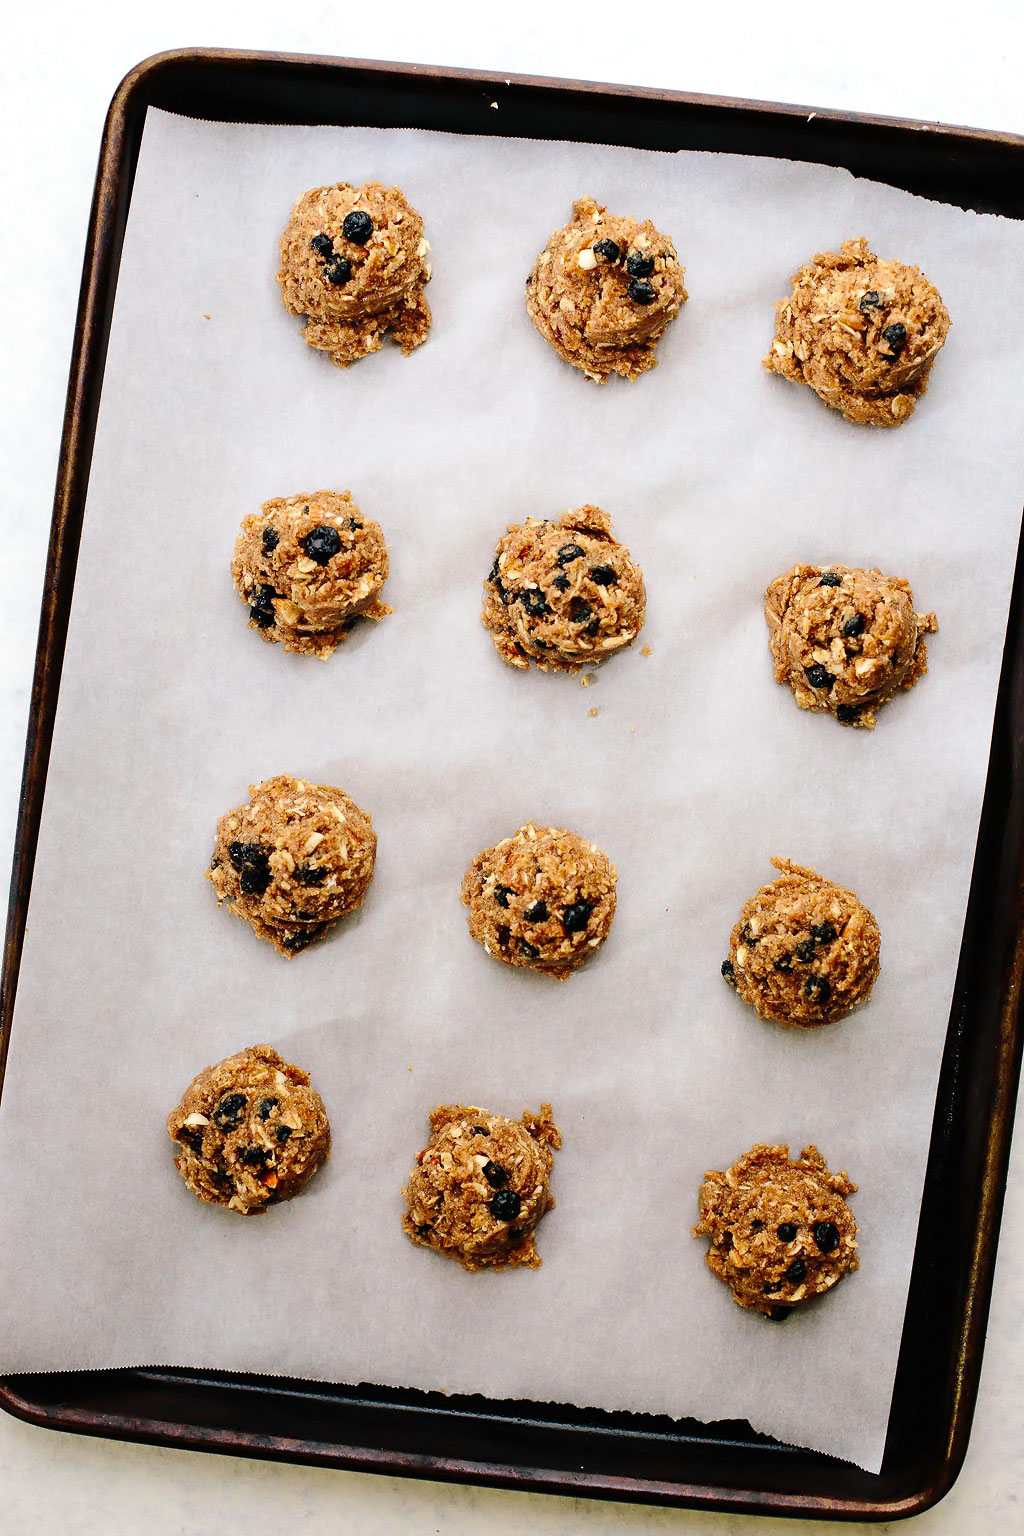 Vegan Blueberry Almond Oat Breakfast Cookies